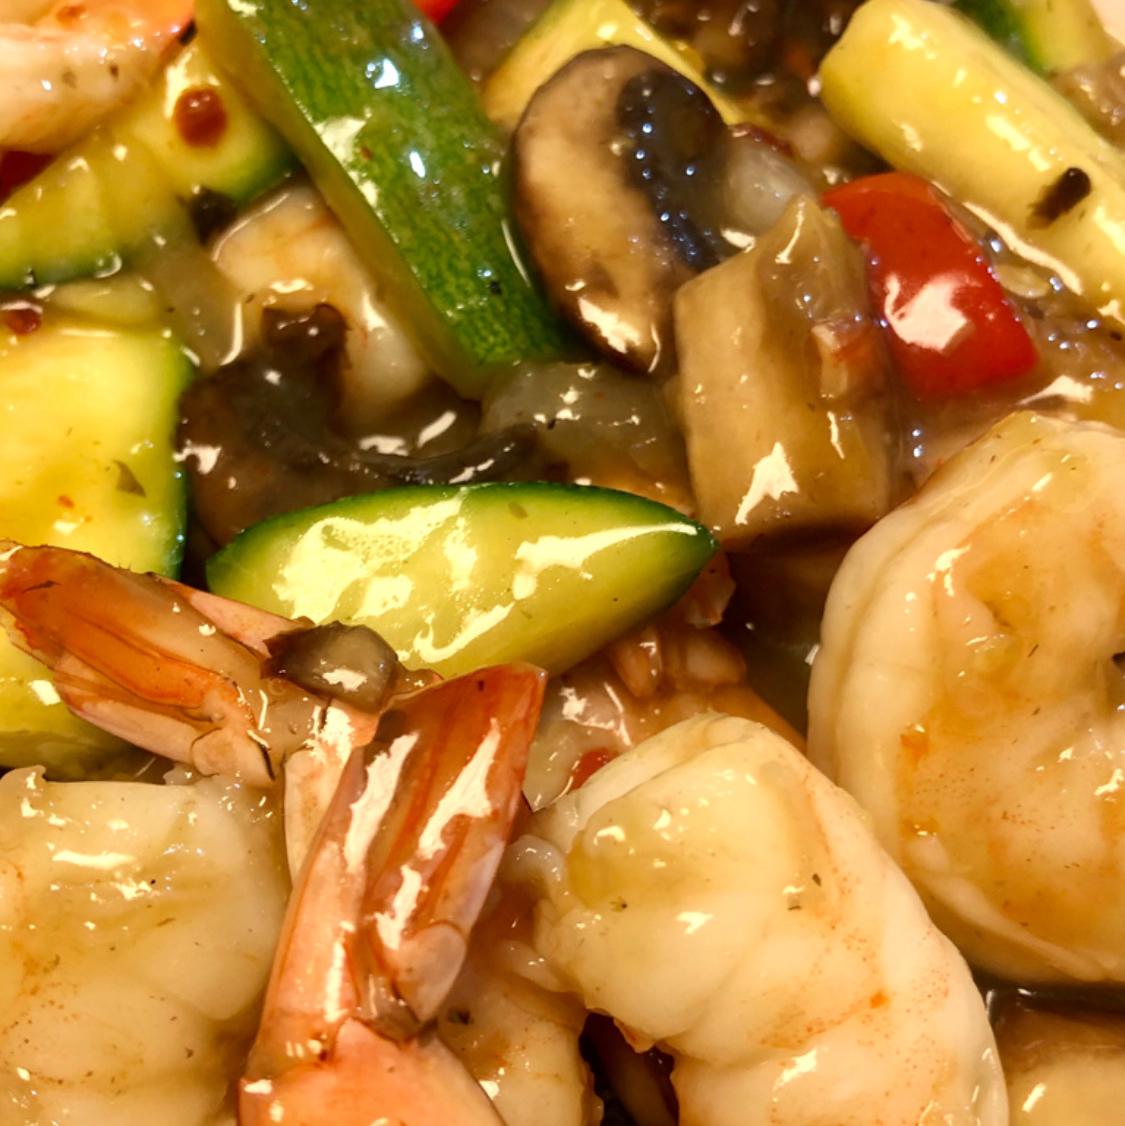 Honey-Ginger Shrimp and Vegetables Aubrey Myers